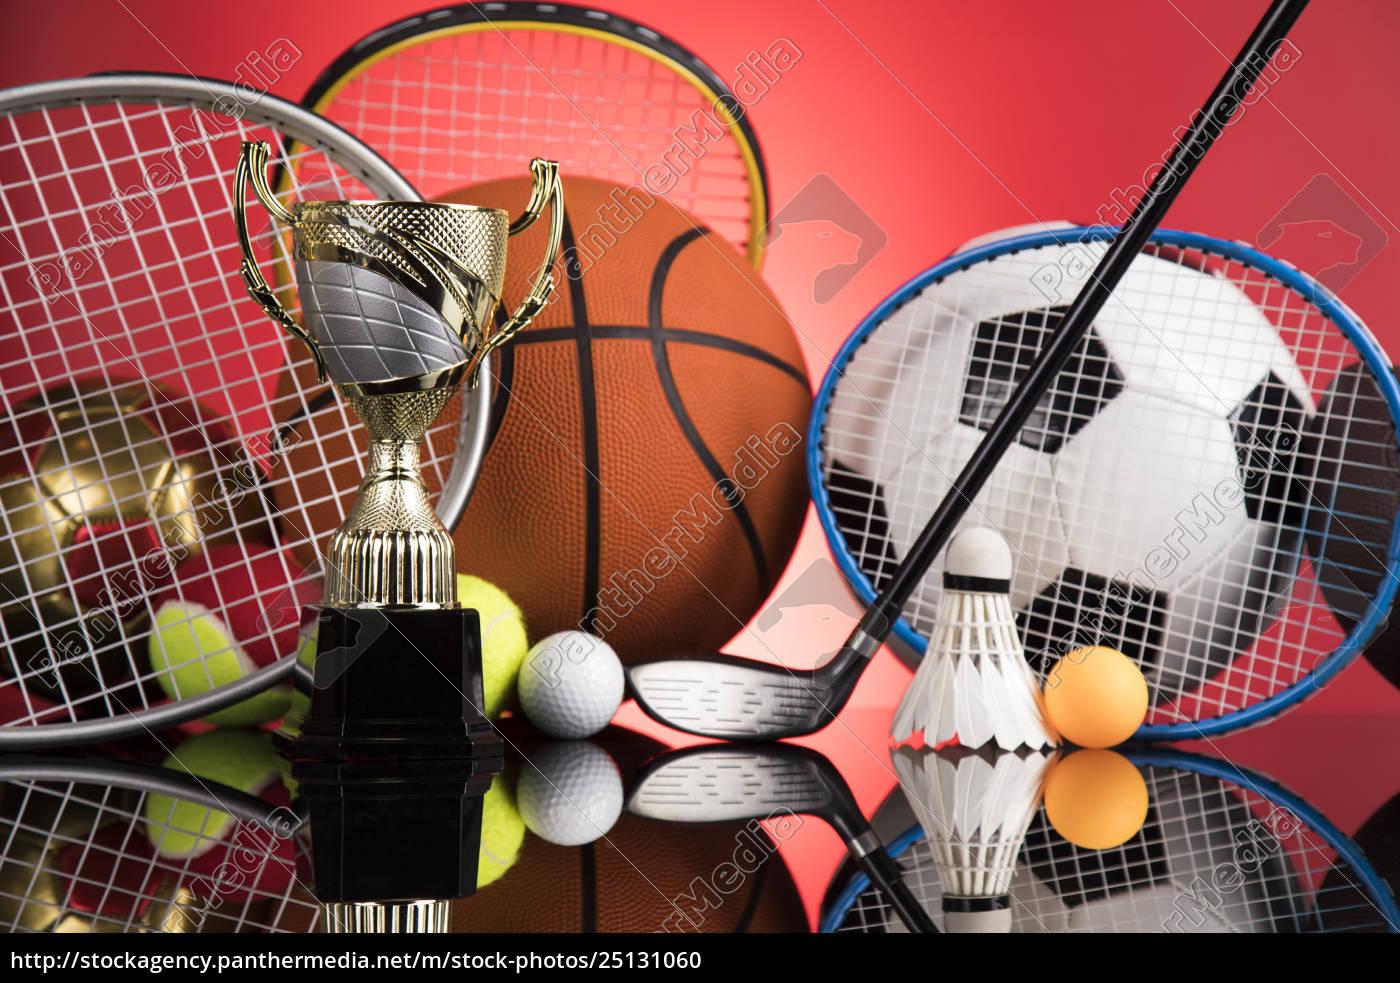 winner, trophy, , , sport, equipment, and - 25131060